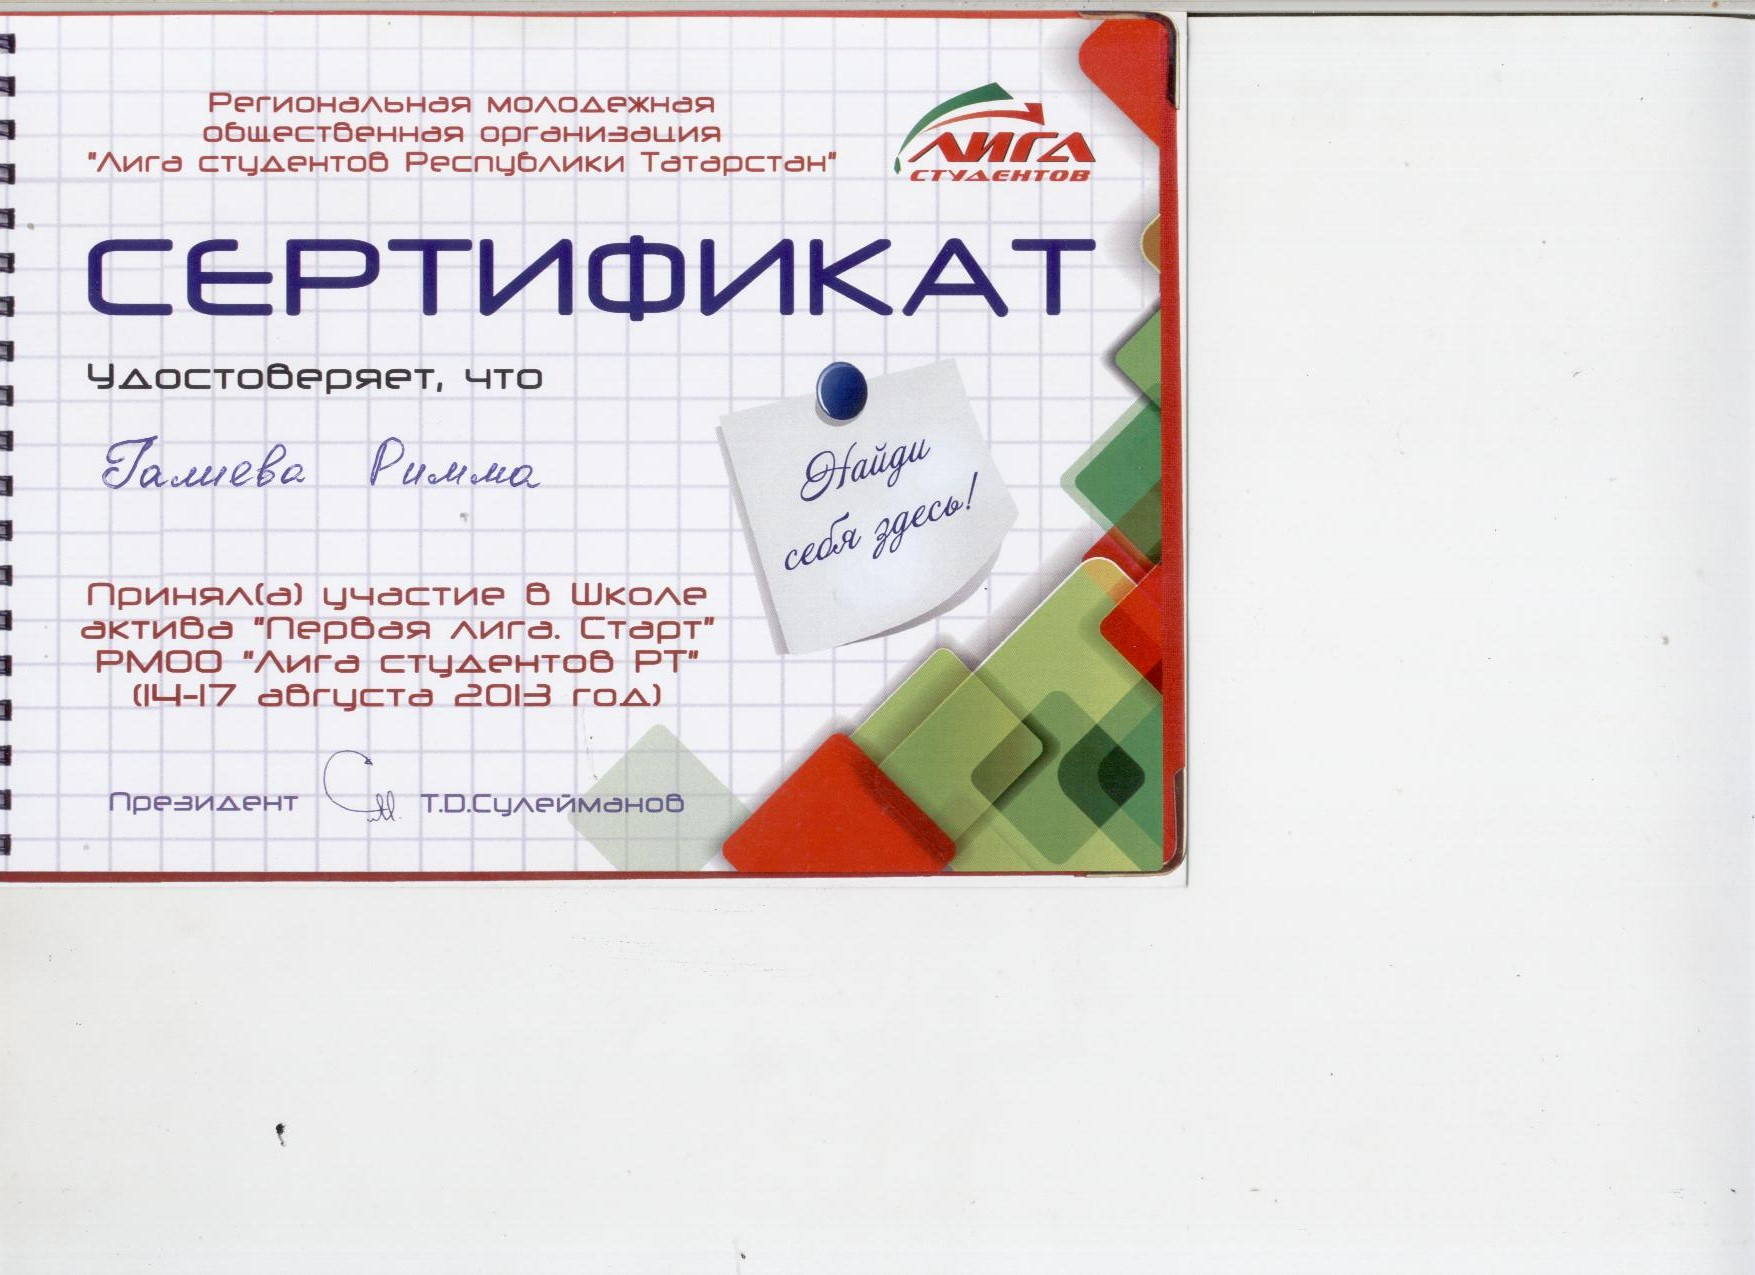 F:\Всероссйский конкурс Портфолио выпускника\РИММА\Римма 016.jpg